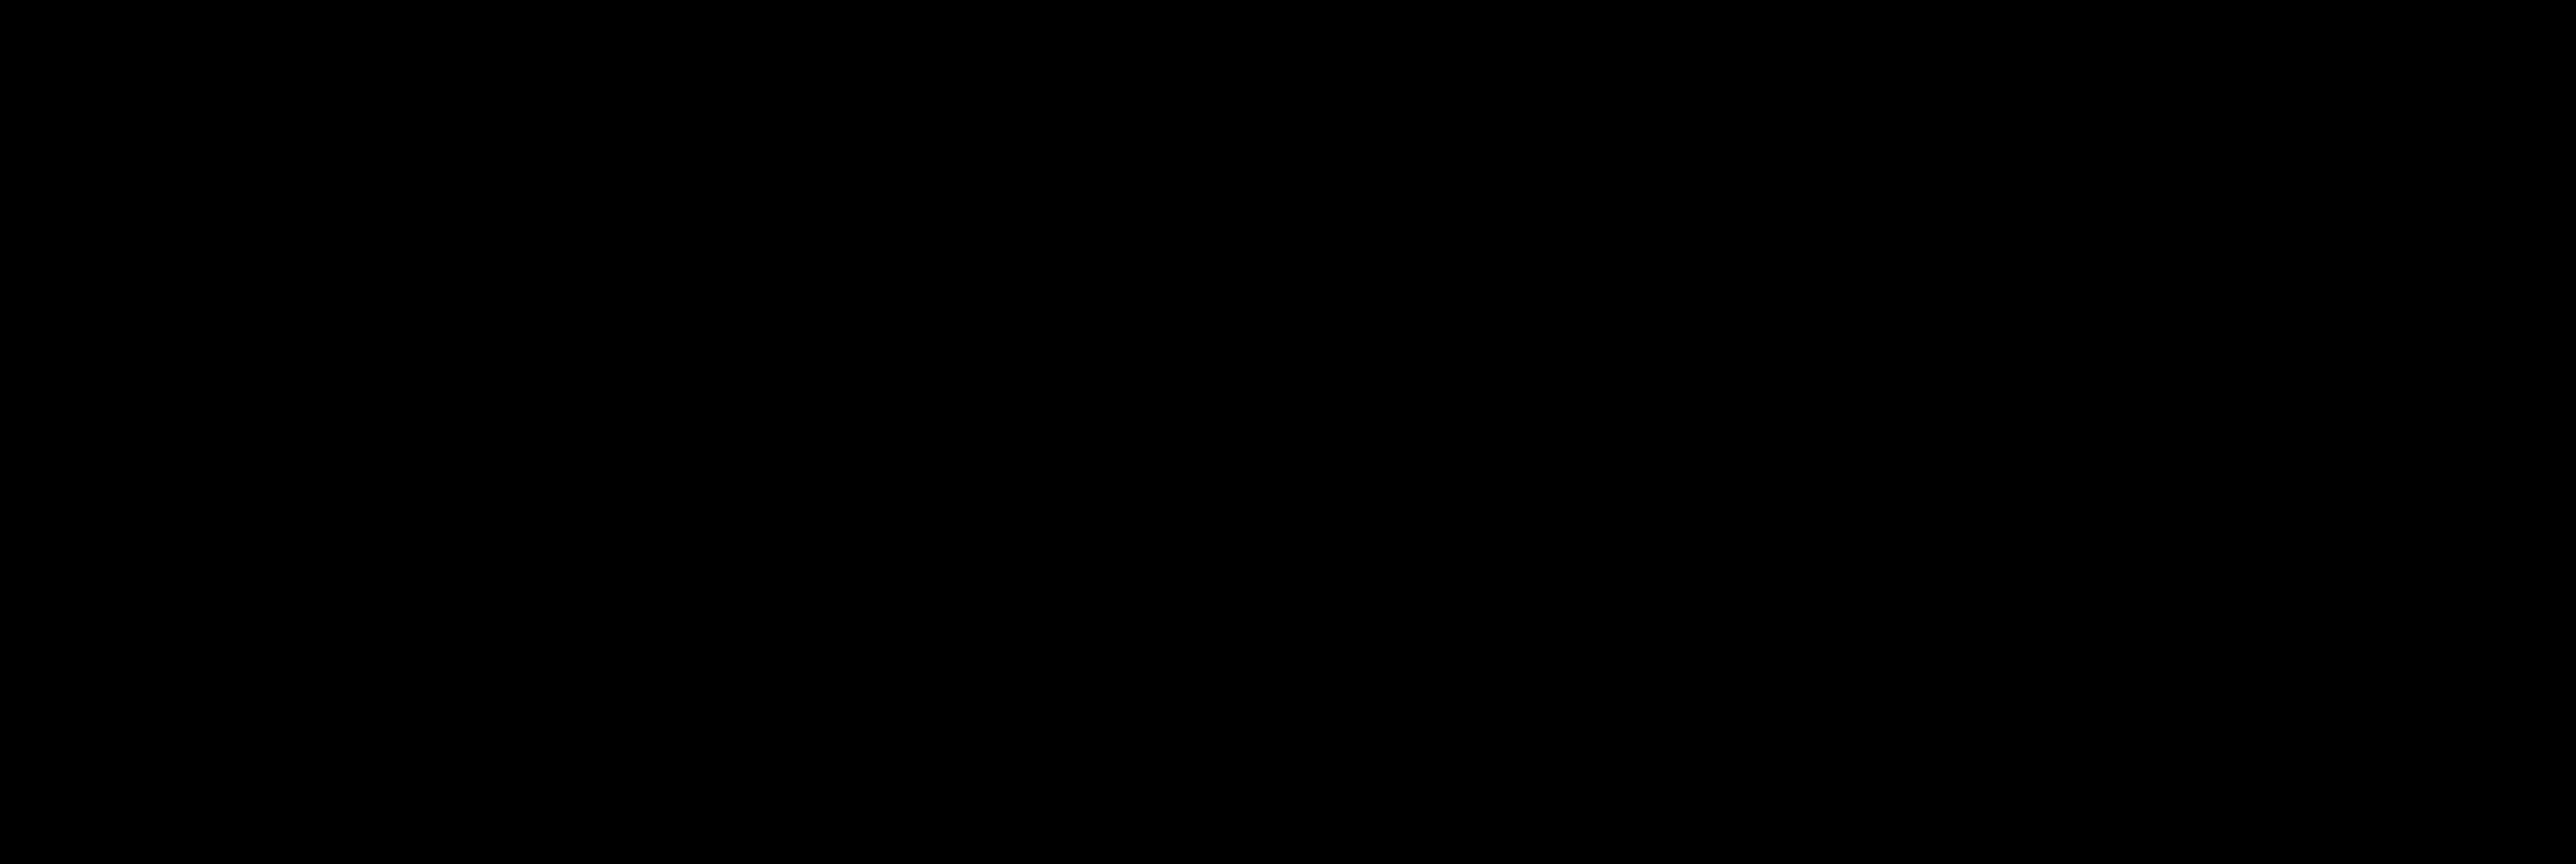 SET Dřez SCHOCK Formhaus D-100S Moonstone + baterie Cosmo Moonstone 525001